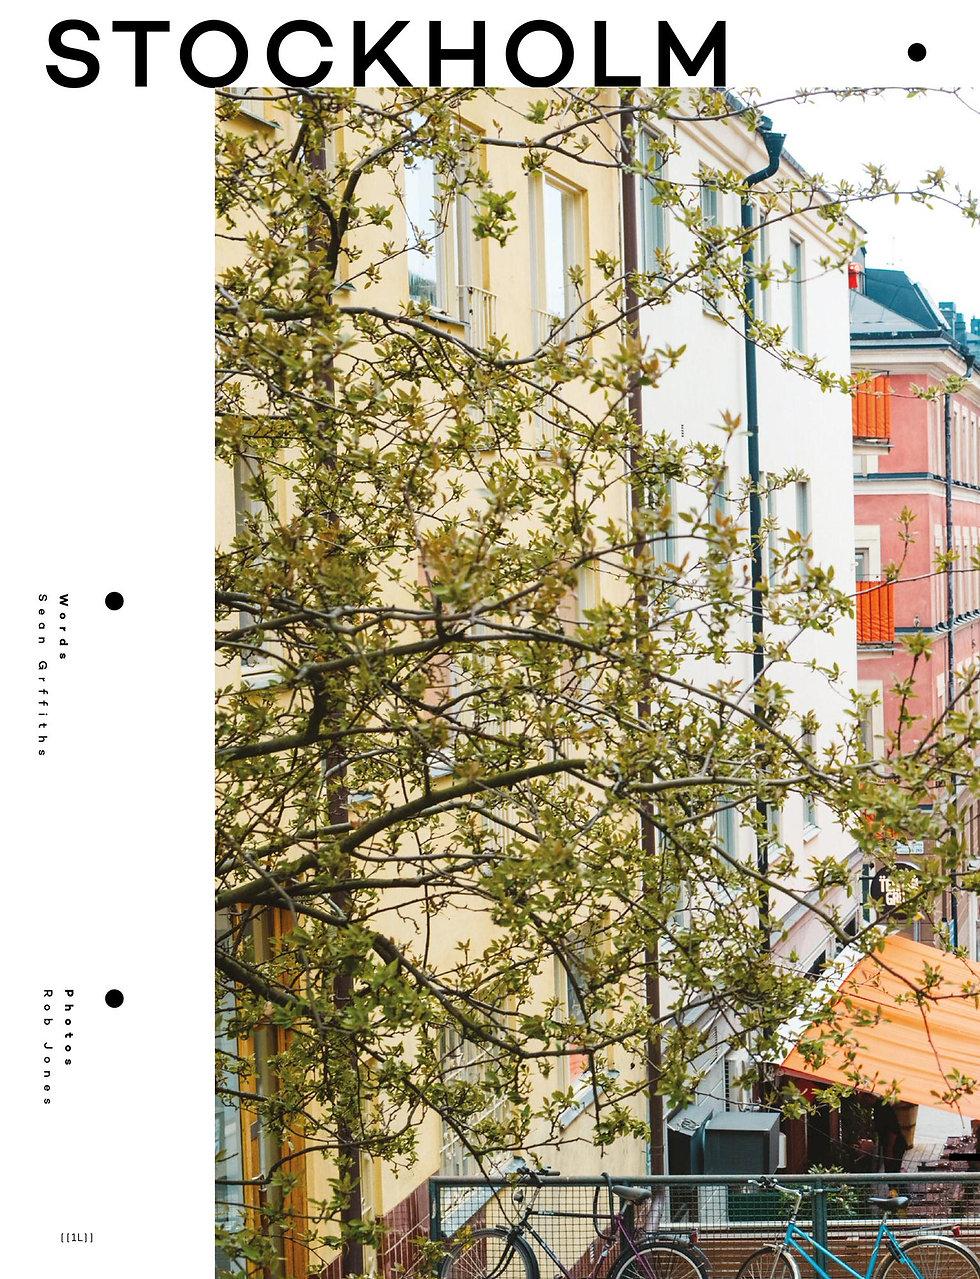 Kornel Kovacs in Stockholm for Mixmag. Studio Barnhaus. Commercial Photography. Photo taken by Rob Jones @hirobjones